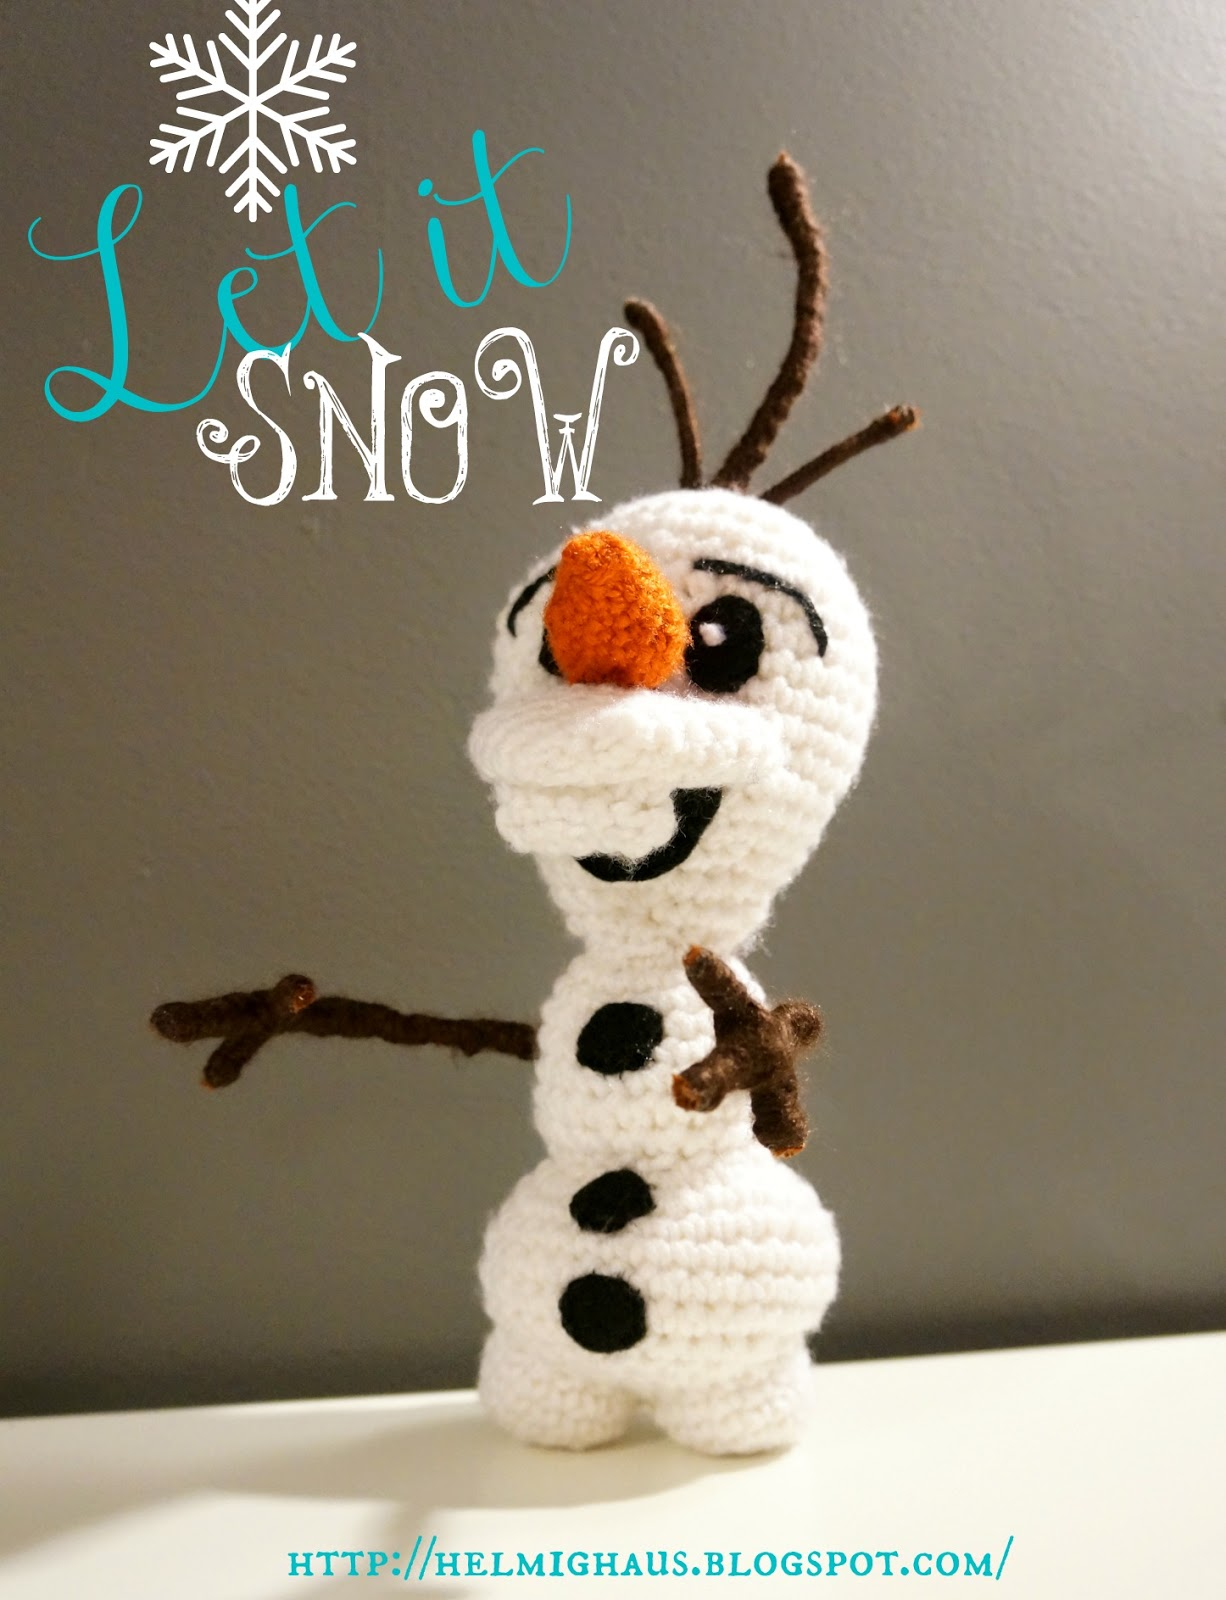 OLAF [CROCHET FREE PATTERNS] – Easy Crochet | Crochet dolls free ... | 1600x1226